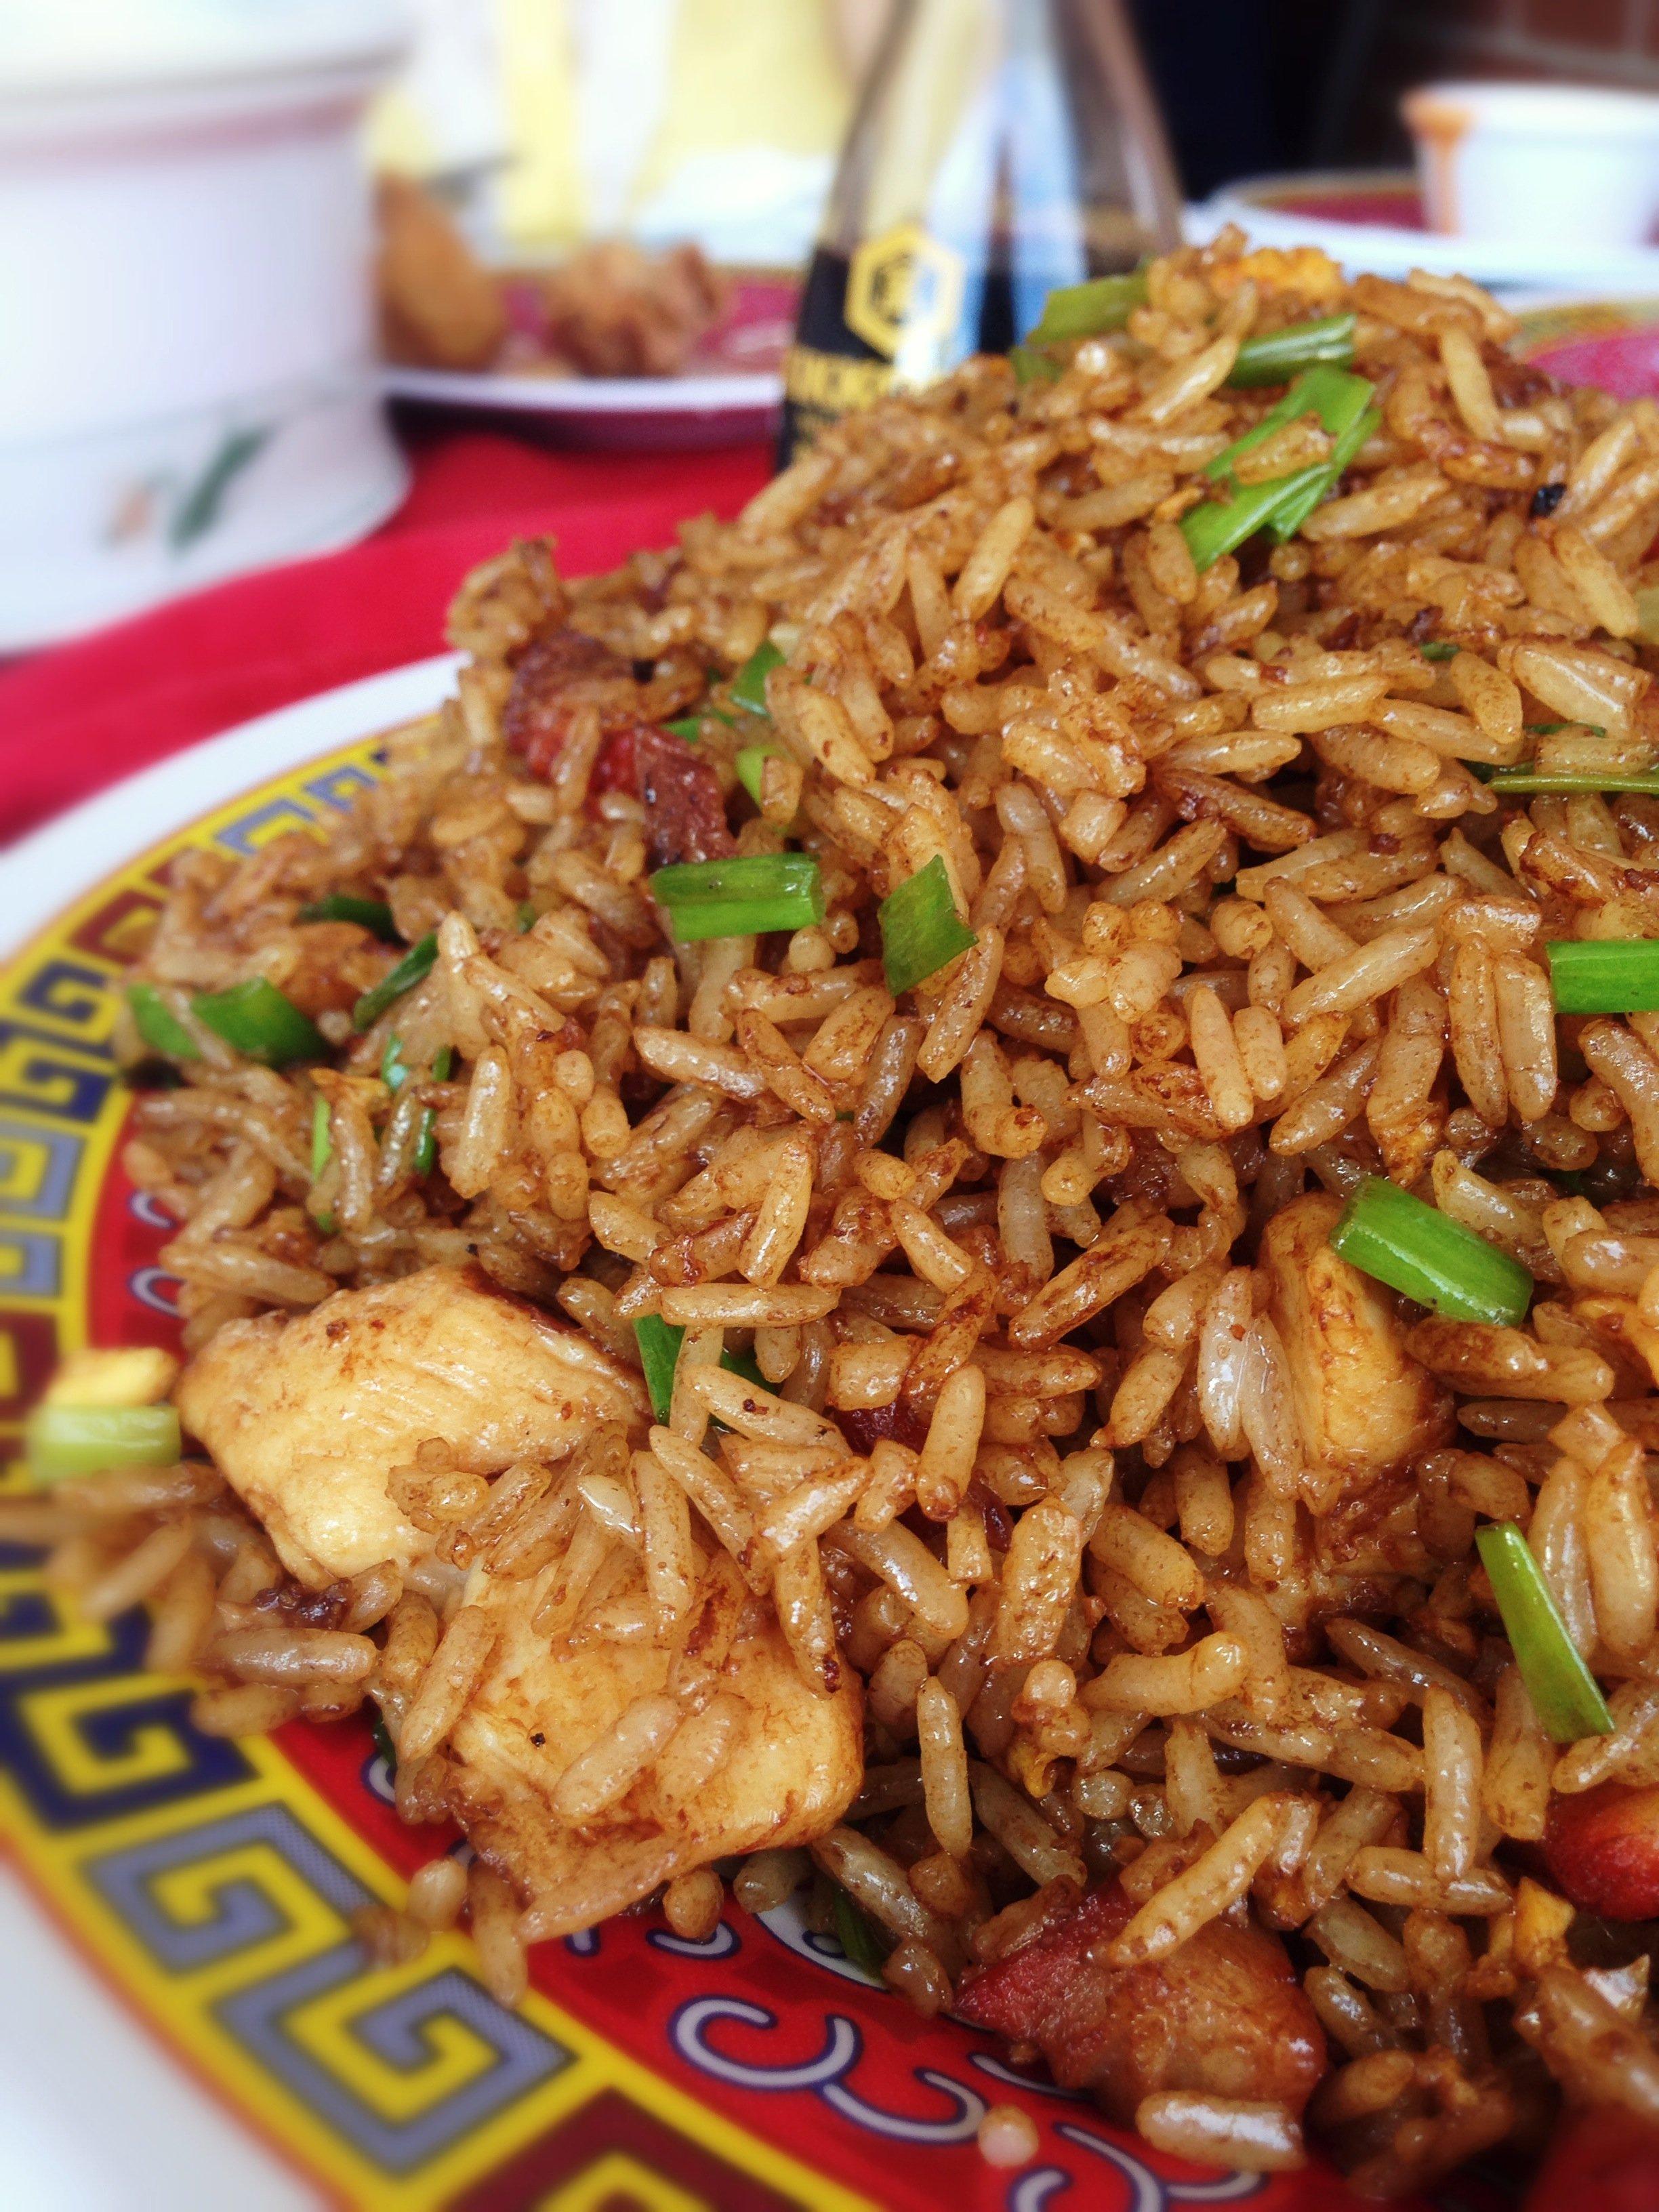 Chow Fan mixto, restaurant Expreso Gran Muralla